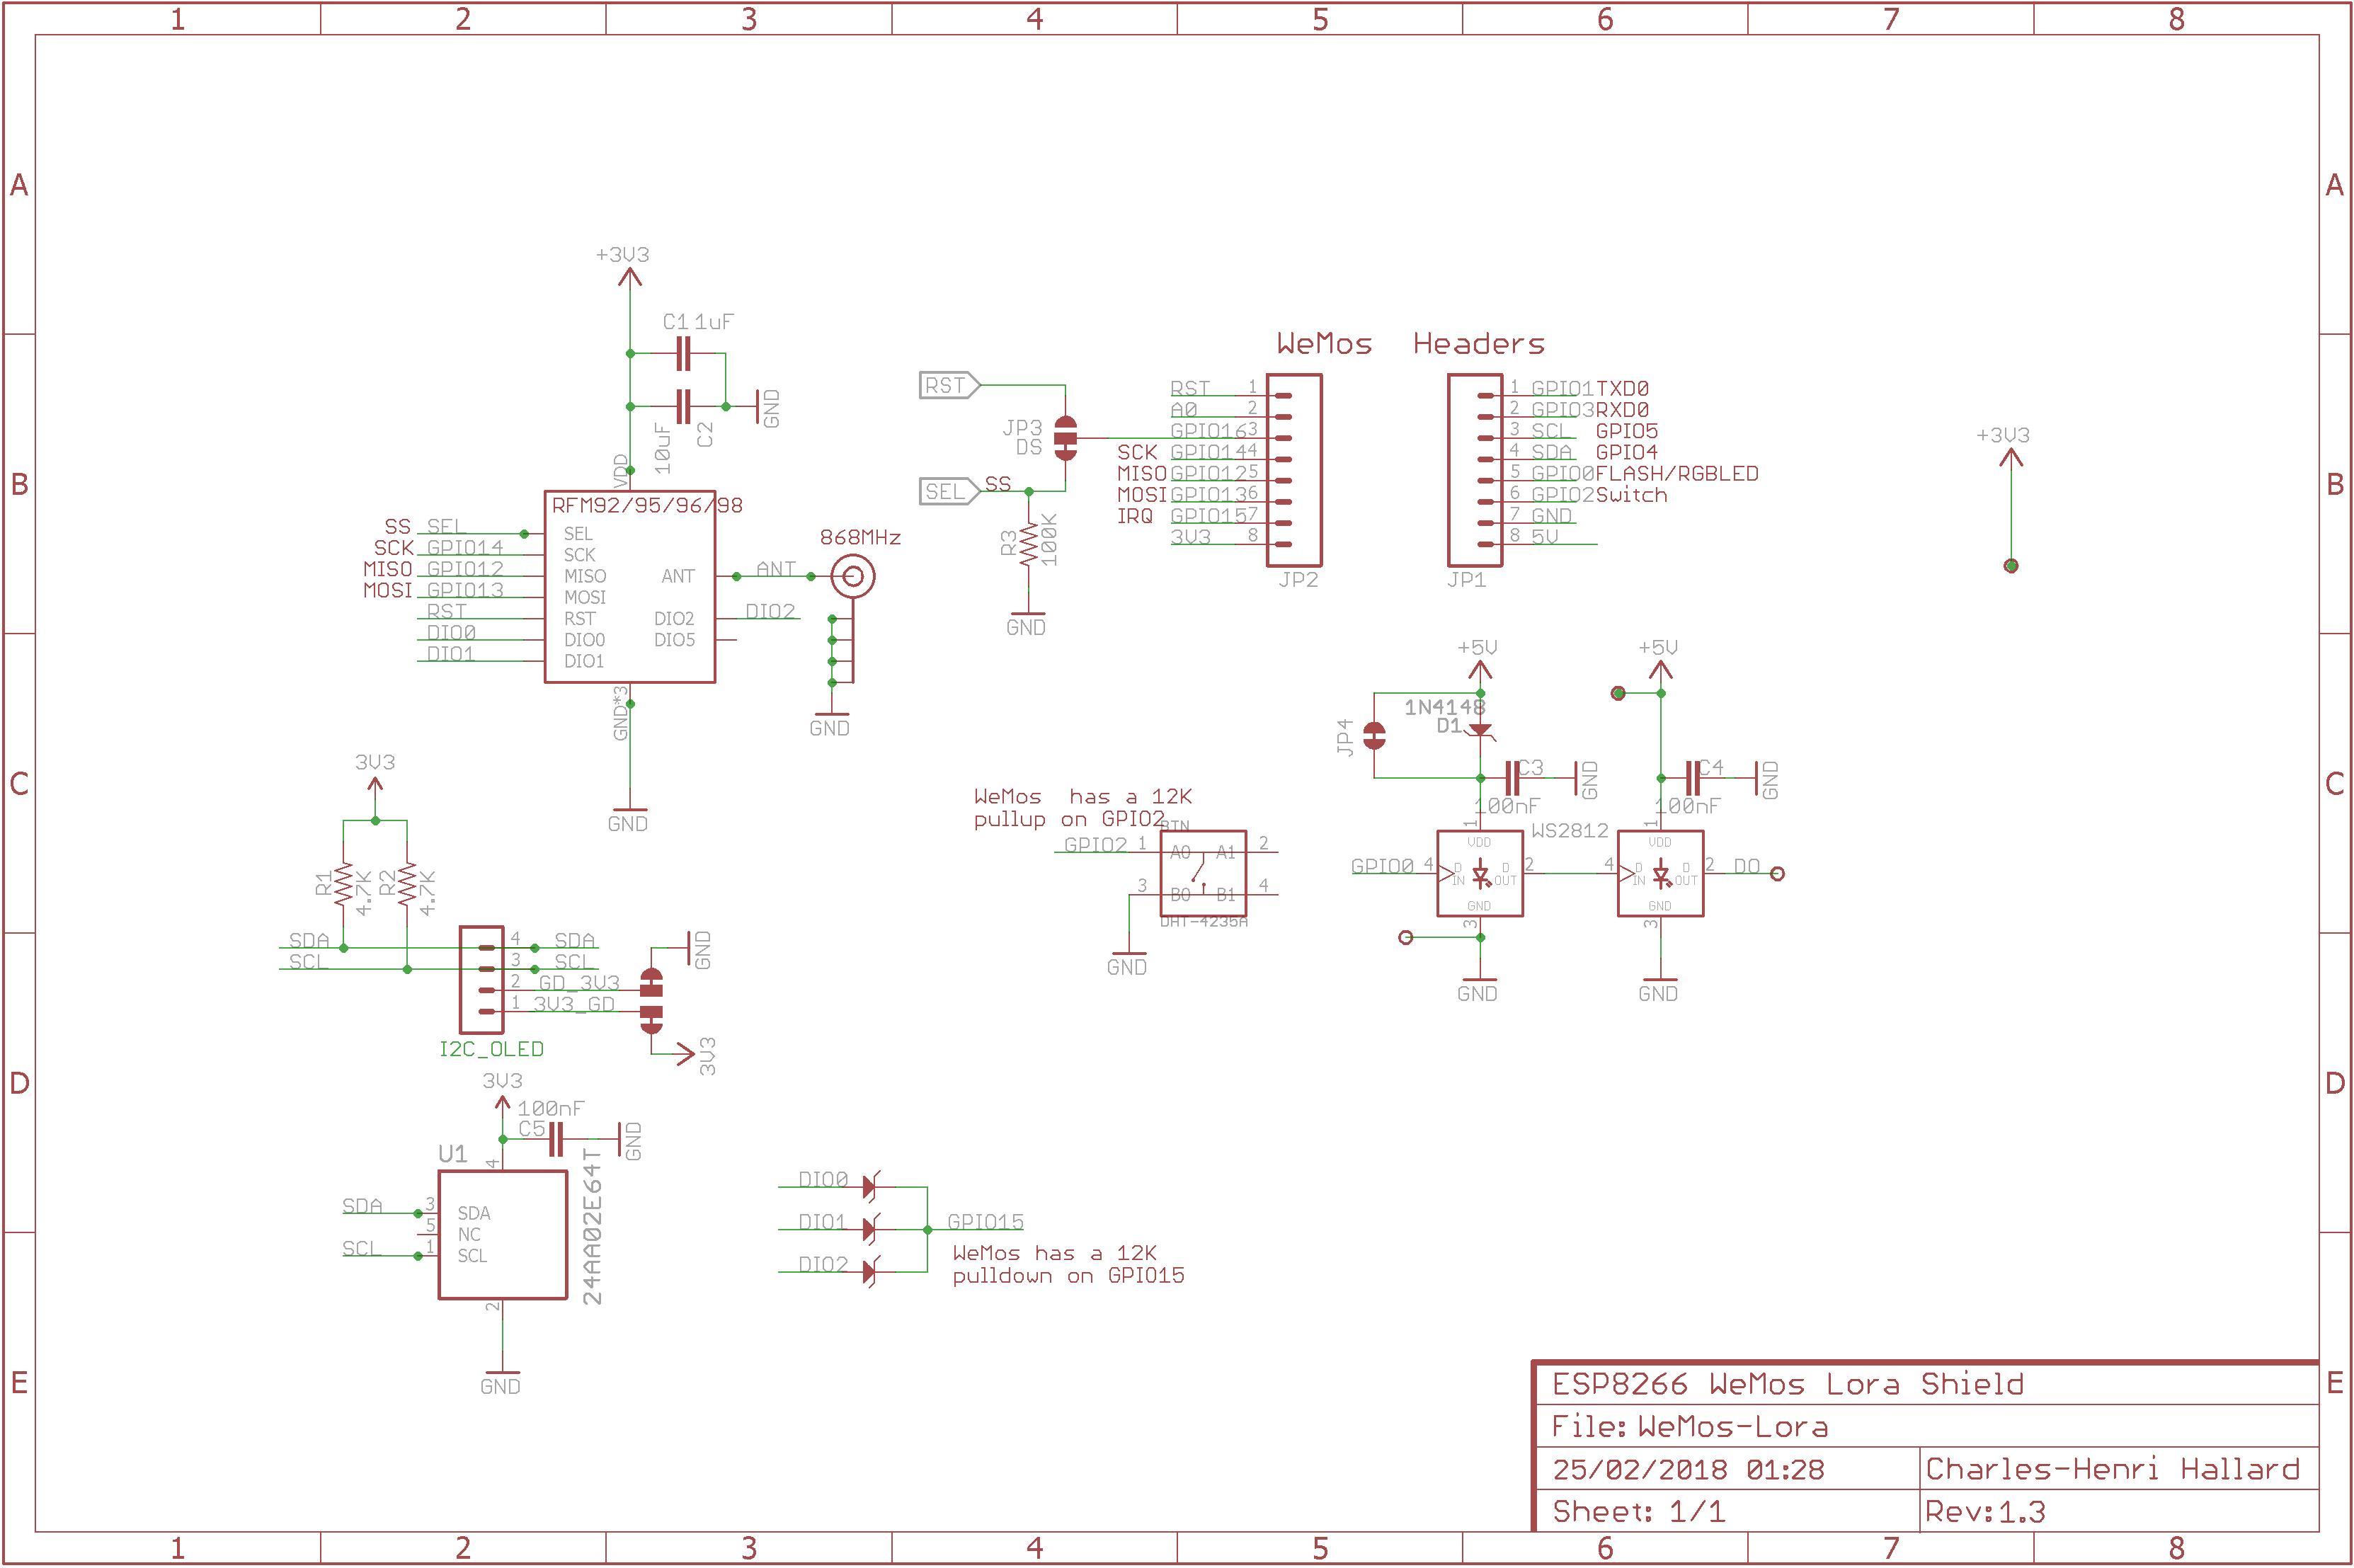 Github Hallard Wemos Lora Esp8266 Shield For Hoperf Rfm95 Rover Mini Spi Wiring Diagram Schematic